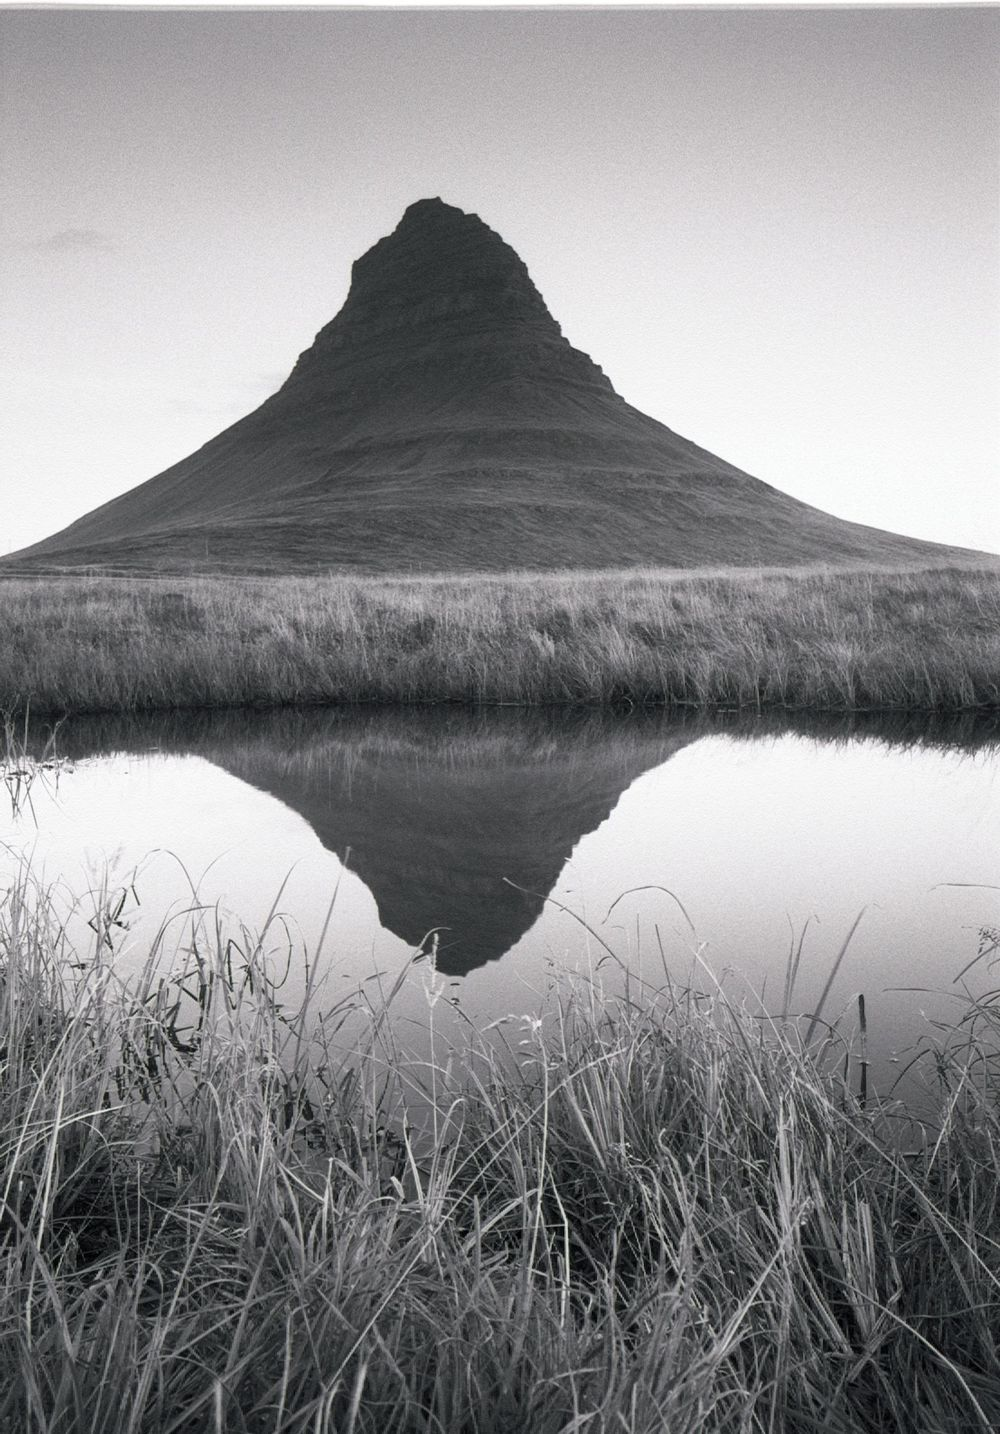 Iceland_BW_002 (8).jpg